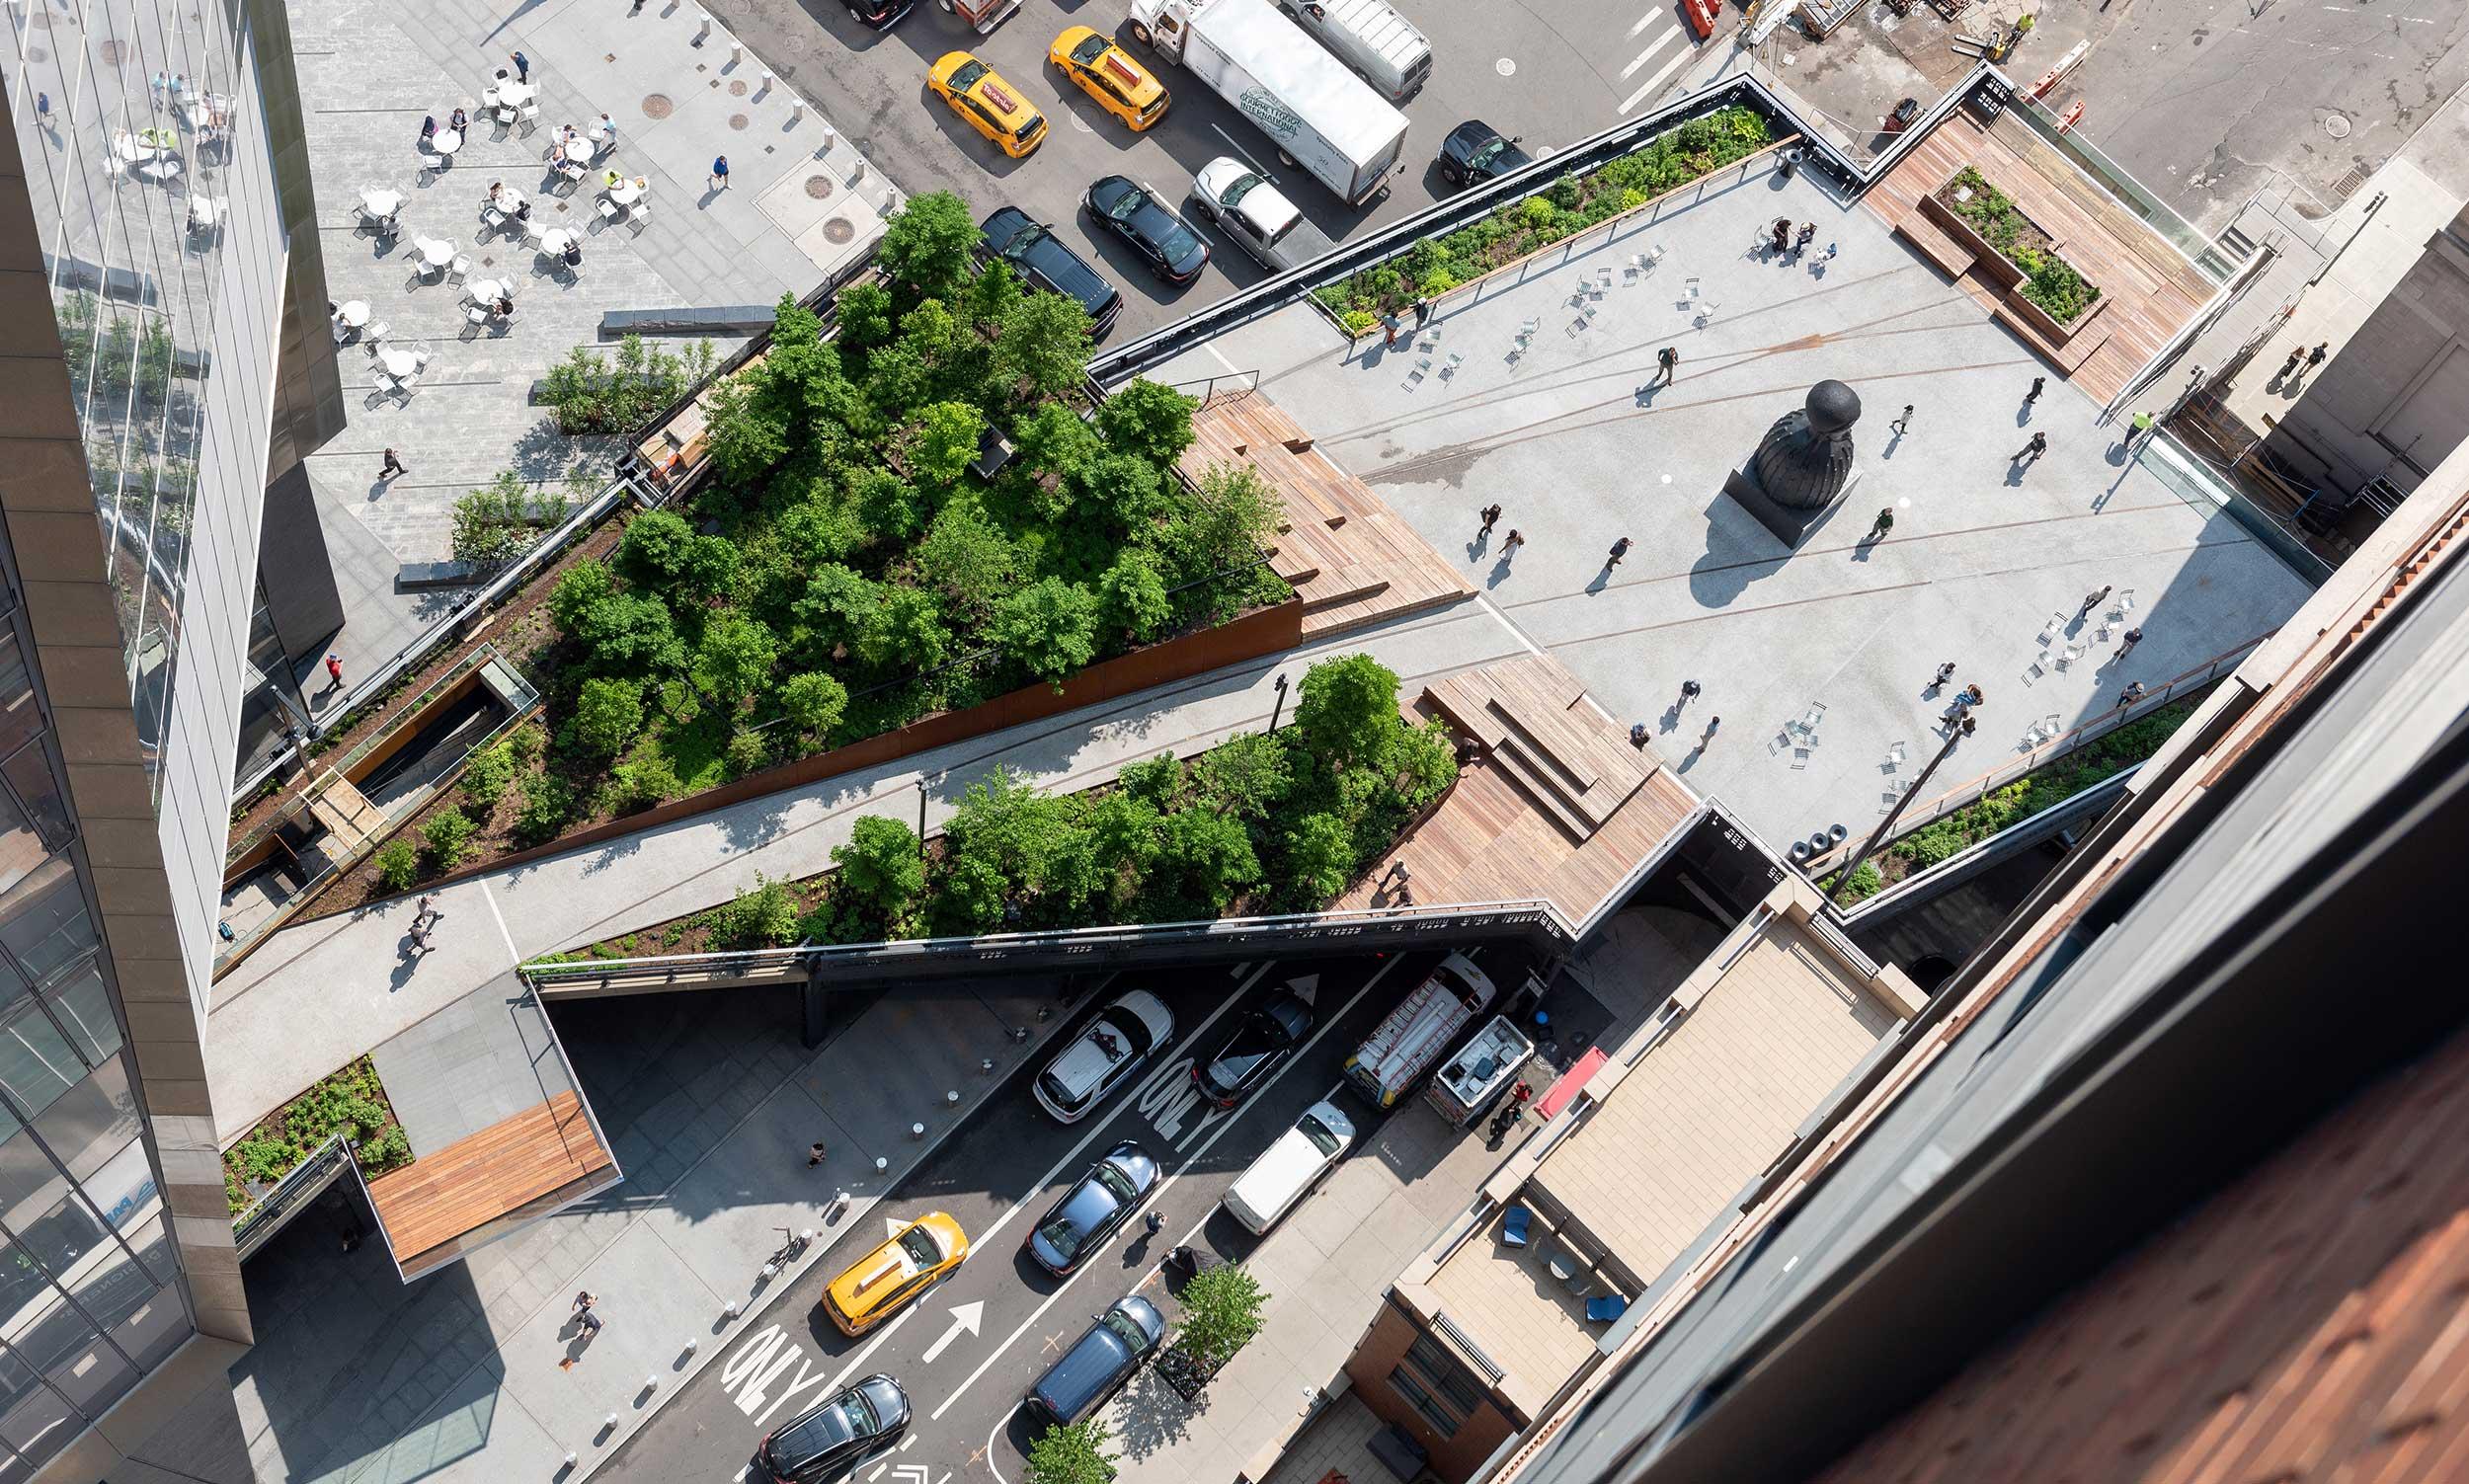 Aerial shot of a portio of the High Line